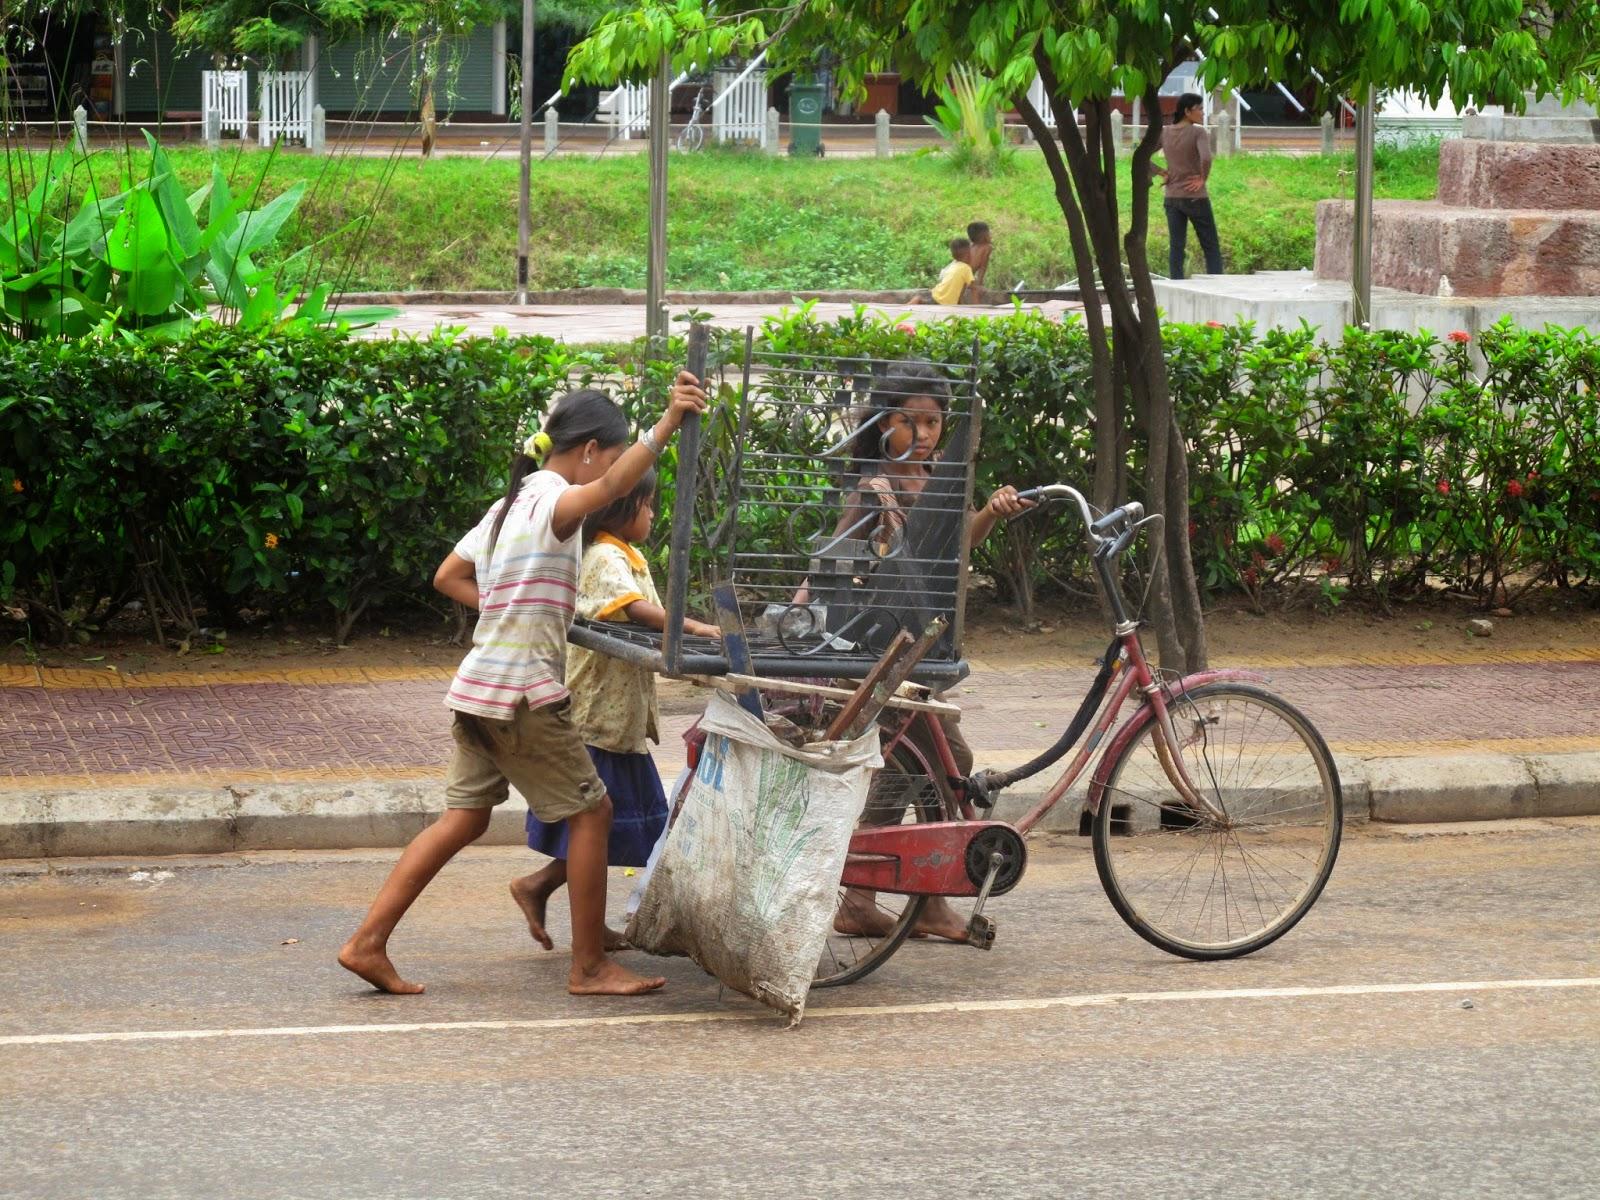 prostitutas de huelva prostitutas en camboya